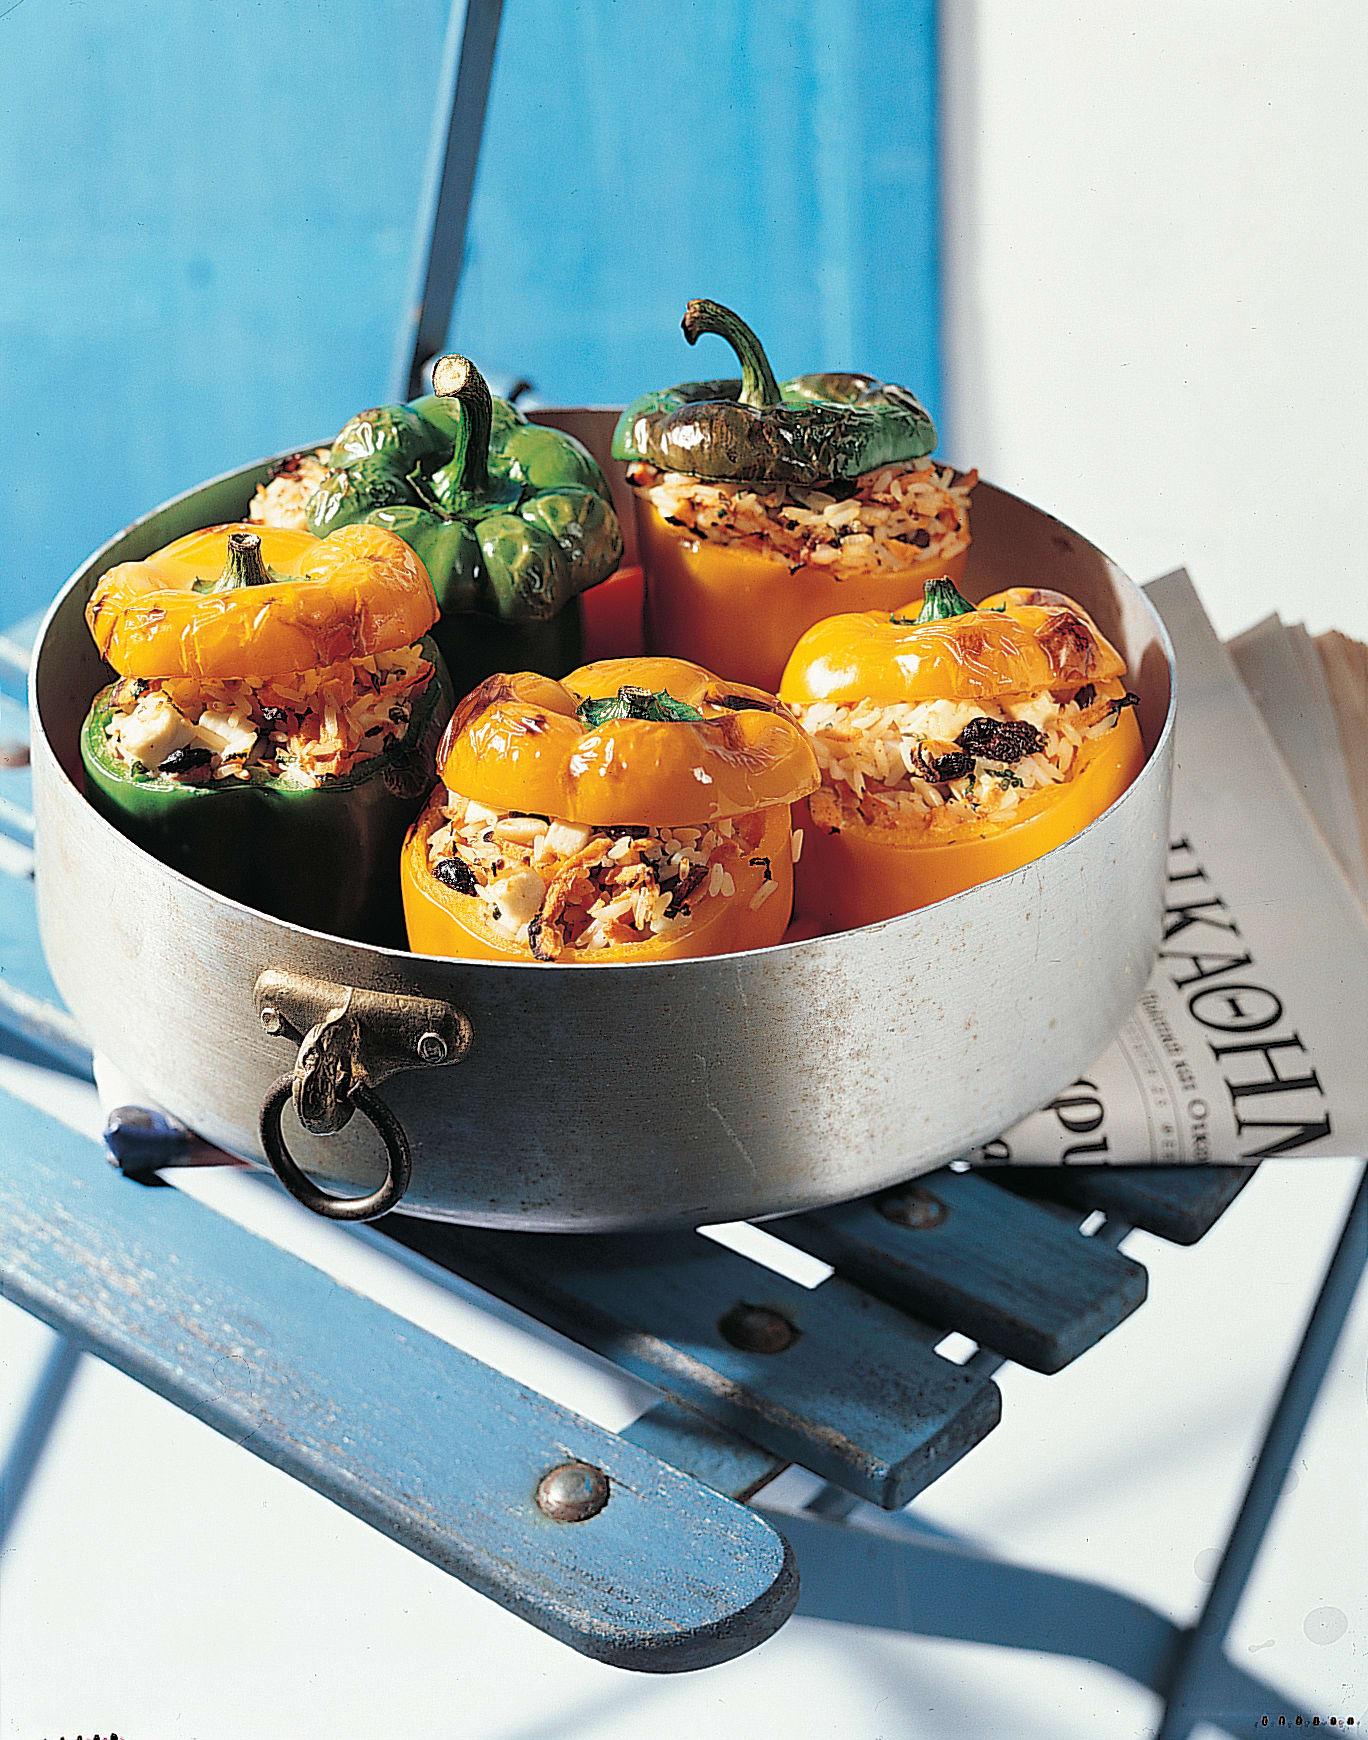 Vegetarisch gefüllte Peperoni (Piperiés jemistés)